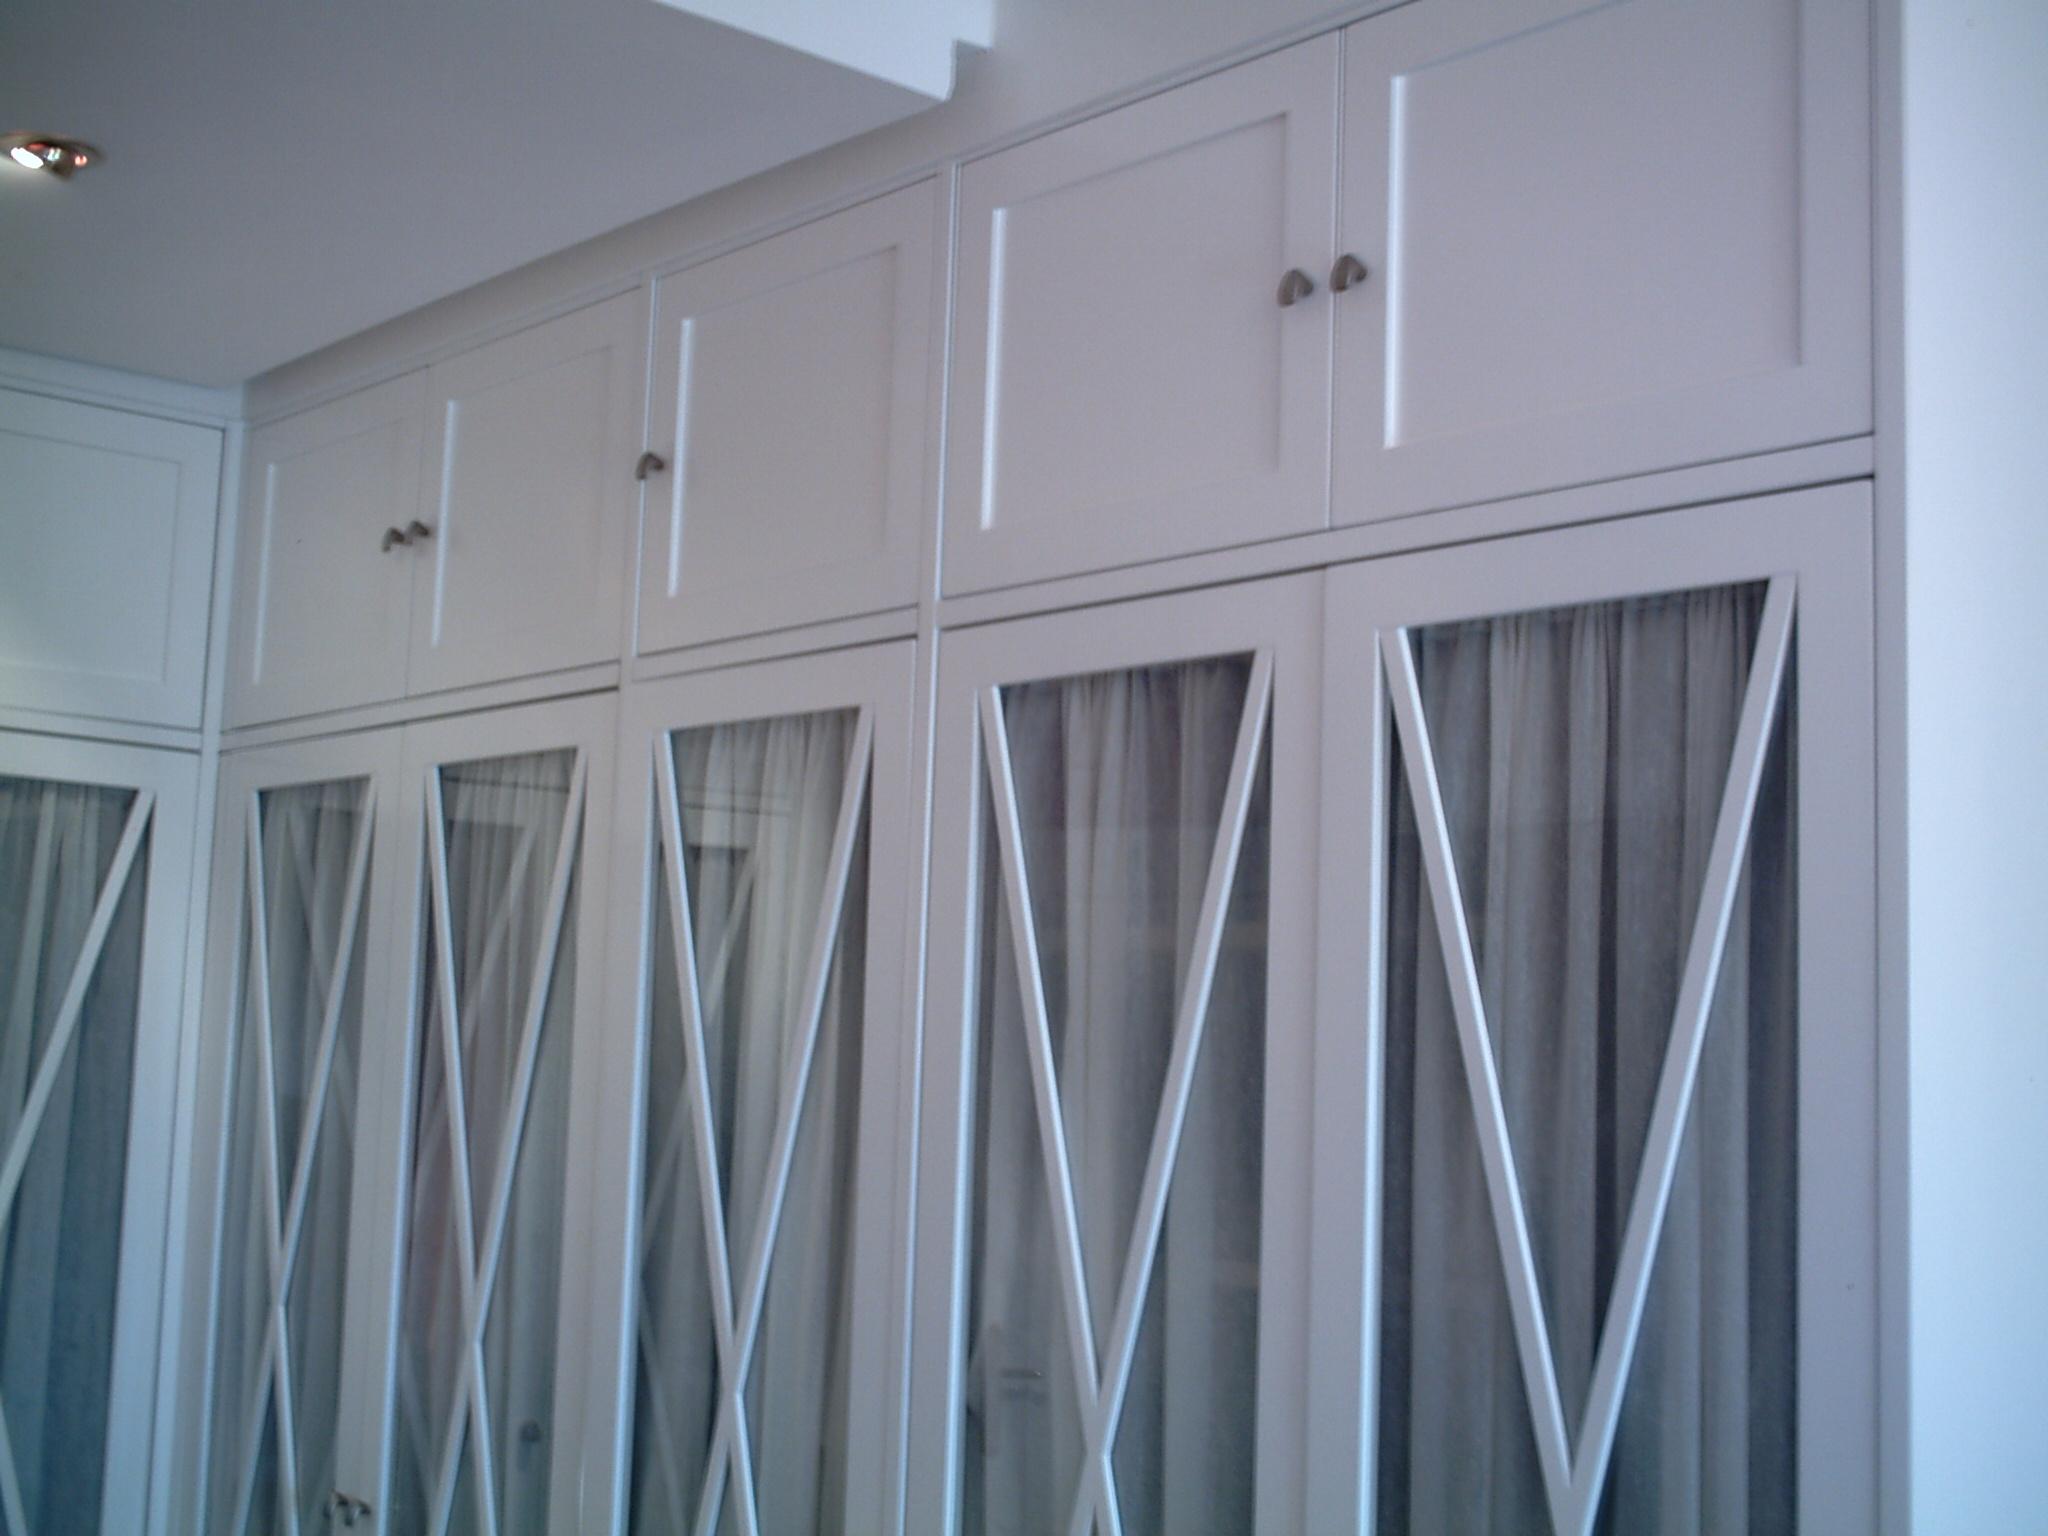 Lacado de maderas corefulgor for Interior de armarios ikea